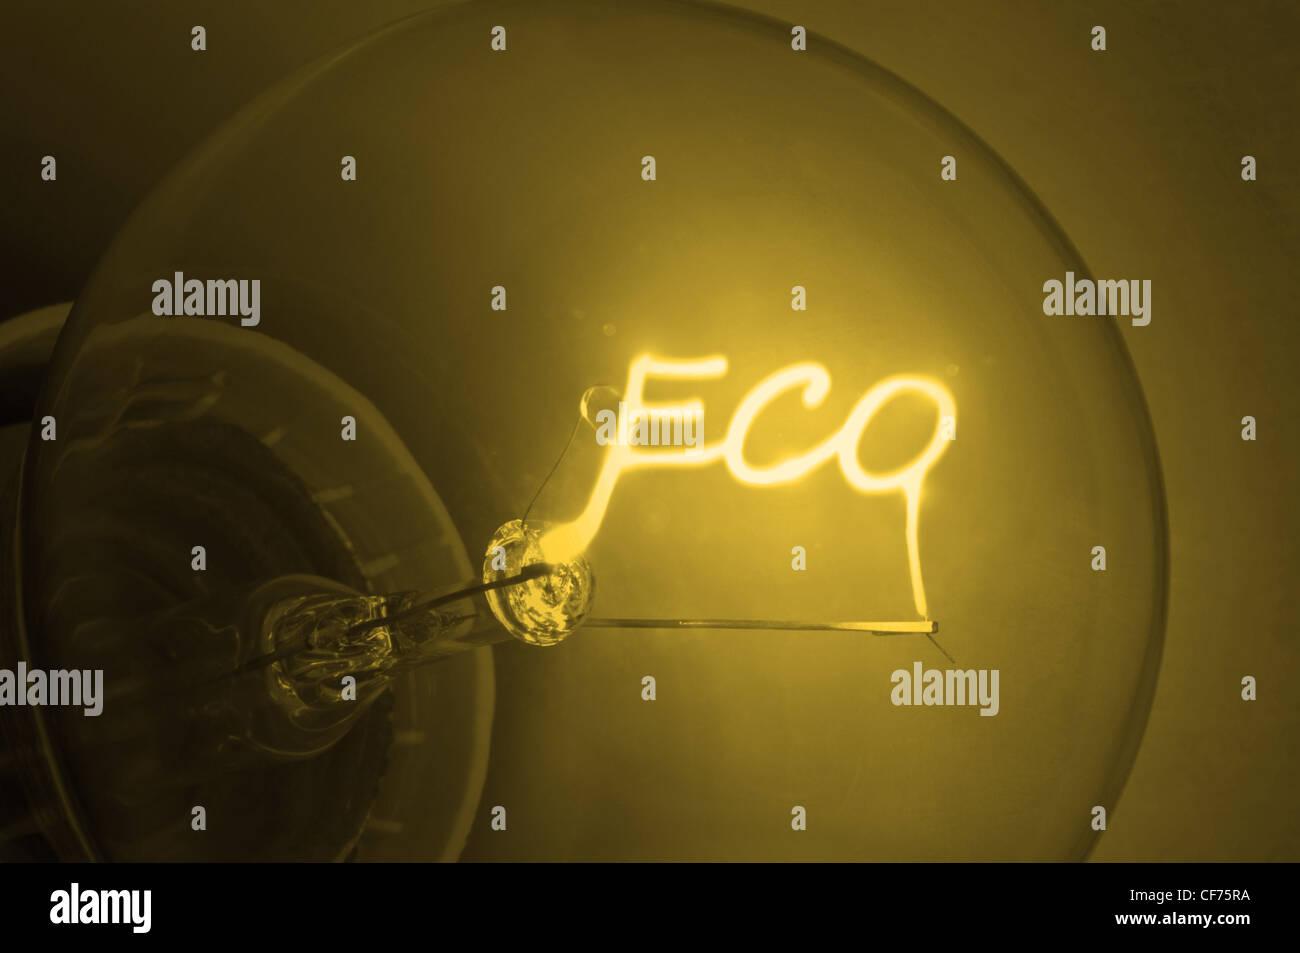 Concepto de energía. Imagen De Stock